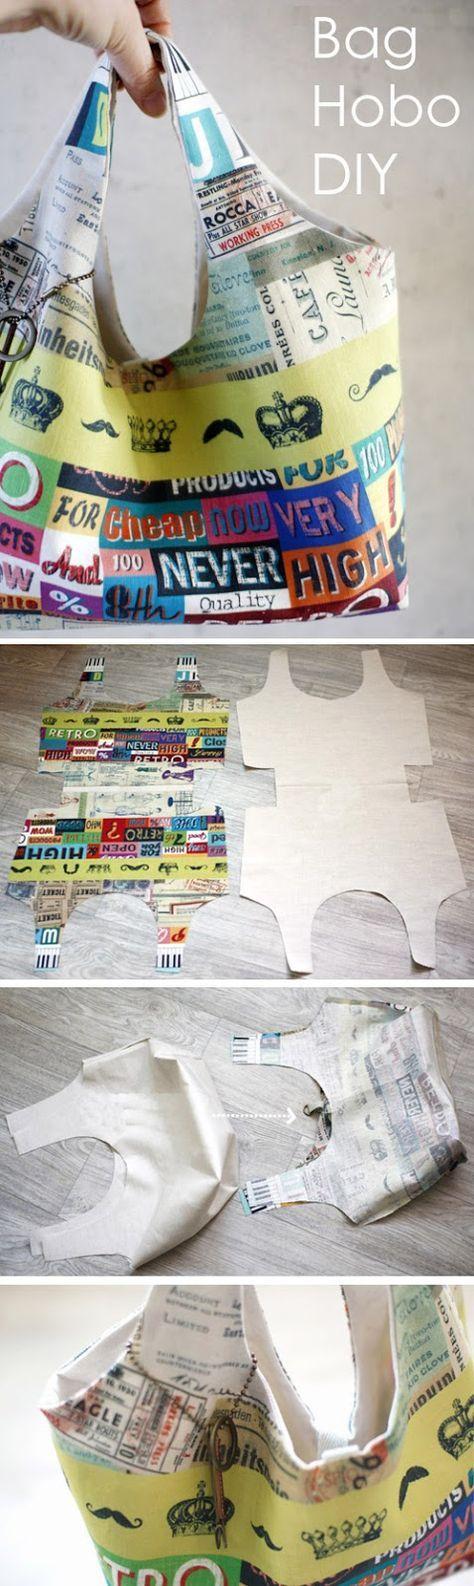 hobo bag sewing tutorial pattern. a step-by-step tutorial with photos. http://www.handmadiya.com/2015/11/fabric-bag-hobo-diy.html